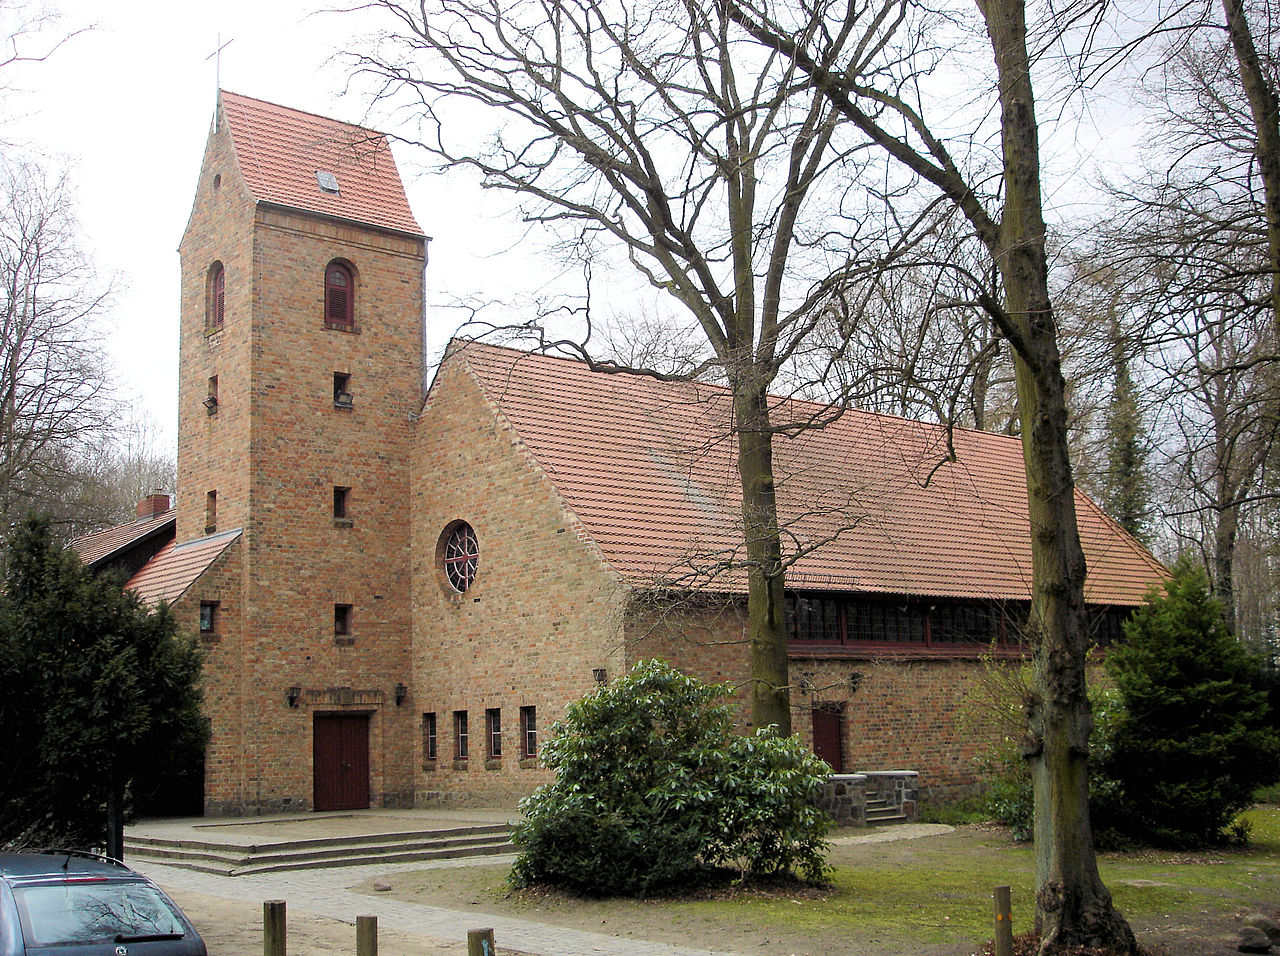 Bild St. Johannis Kirche Rostock